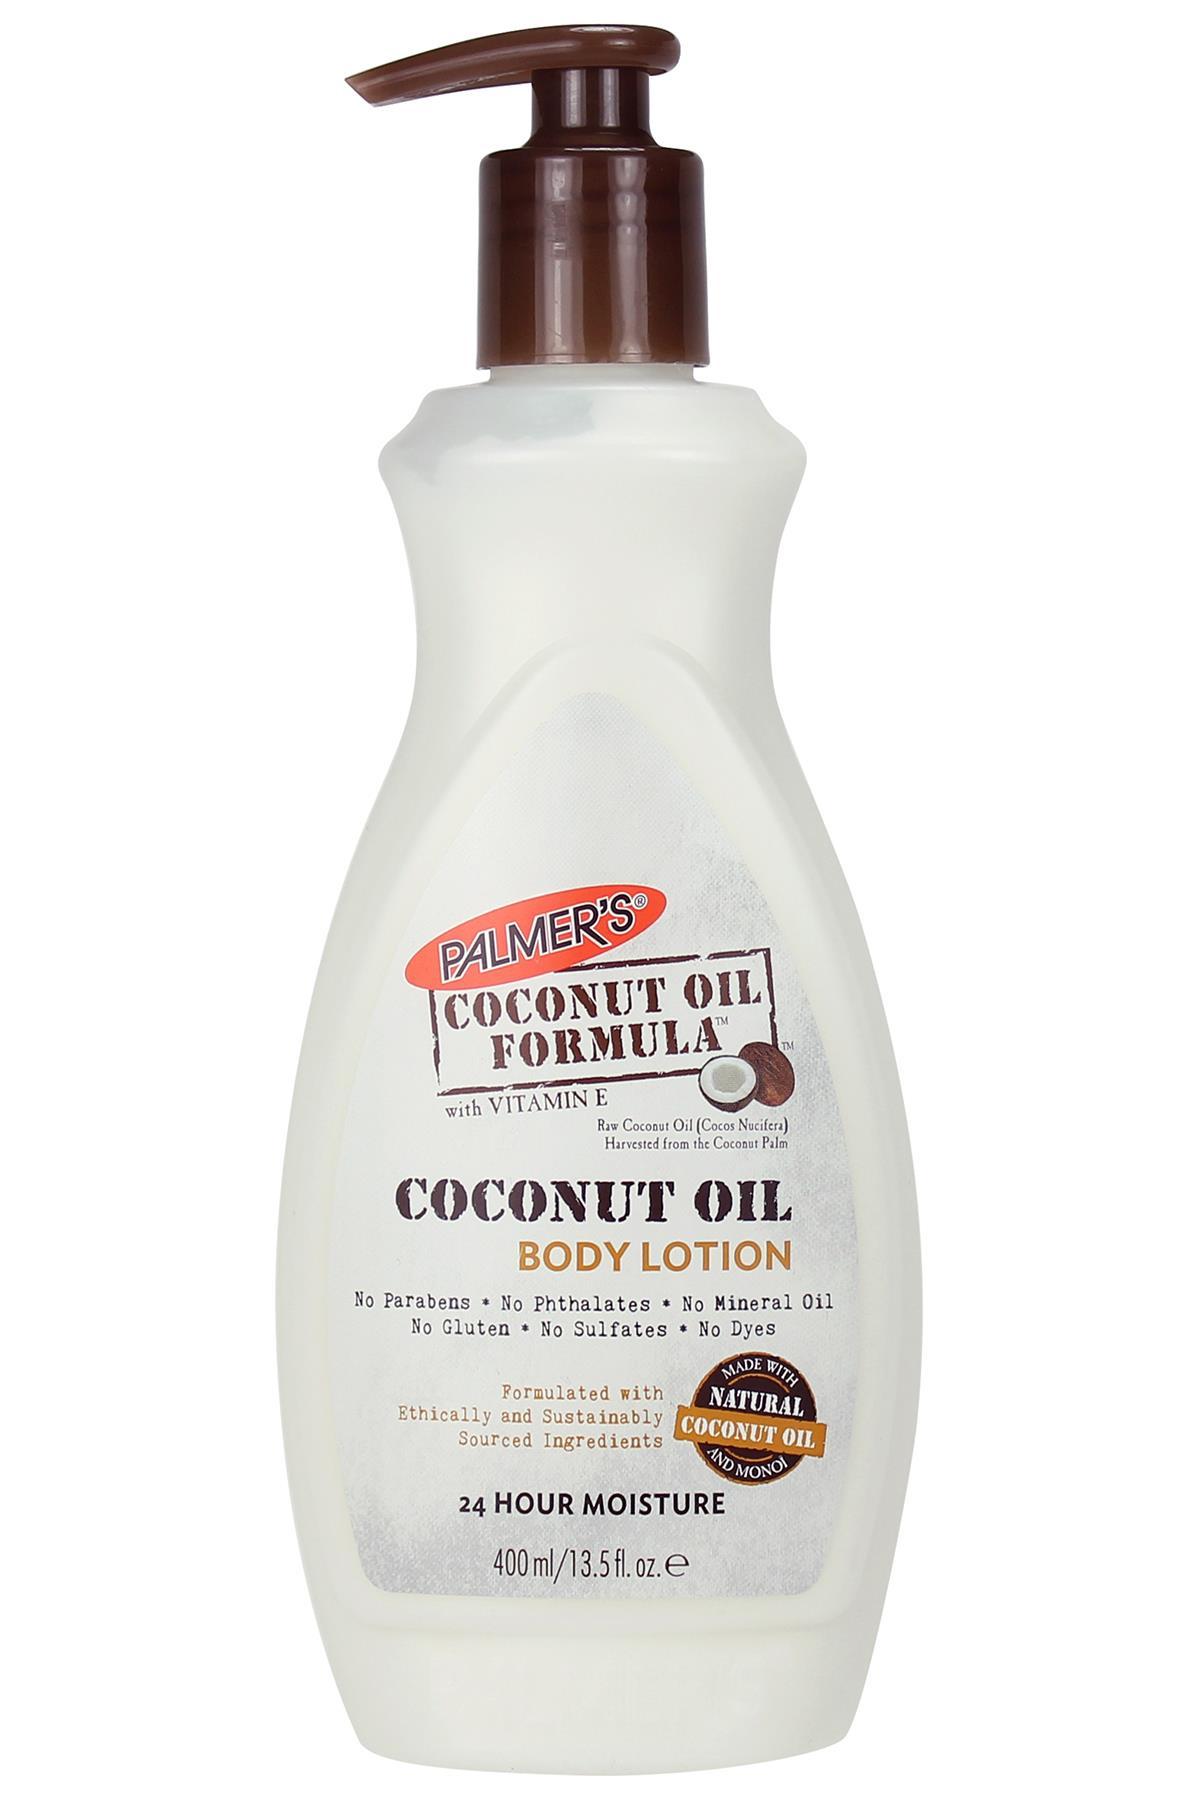 Palmer's Coconut Oil Body Lotion 400 ml